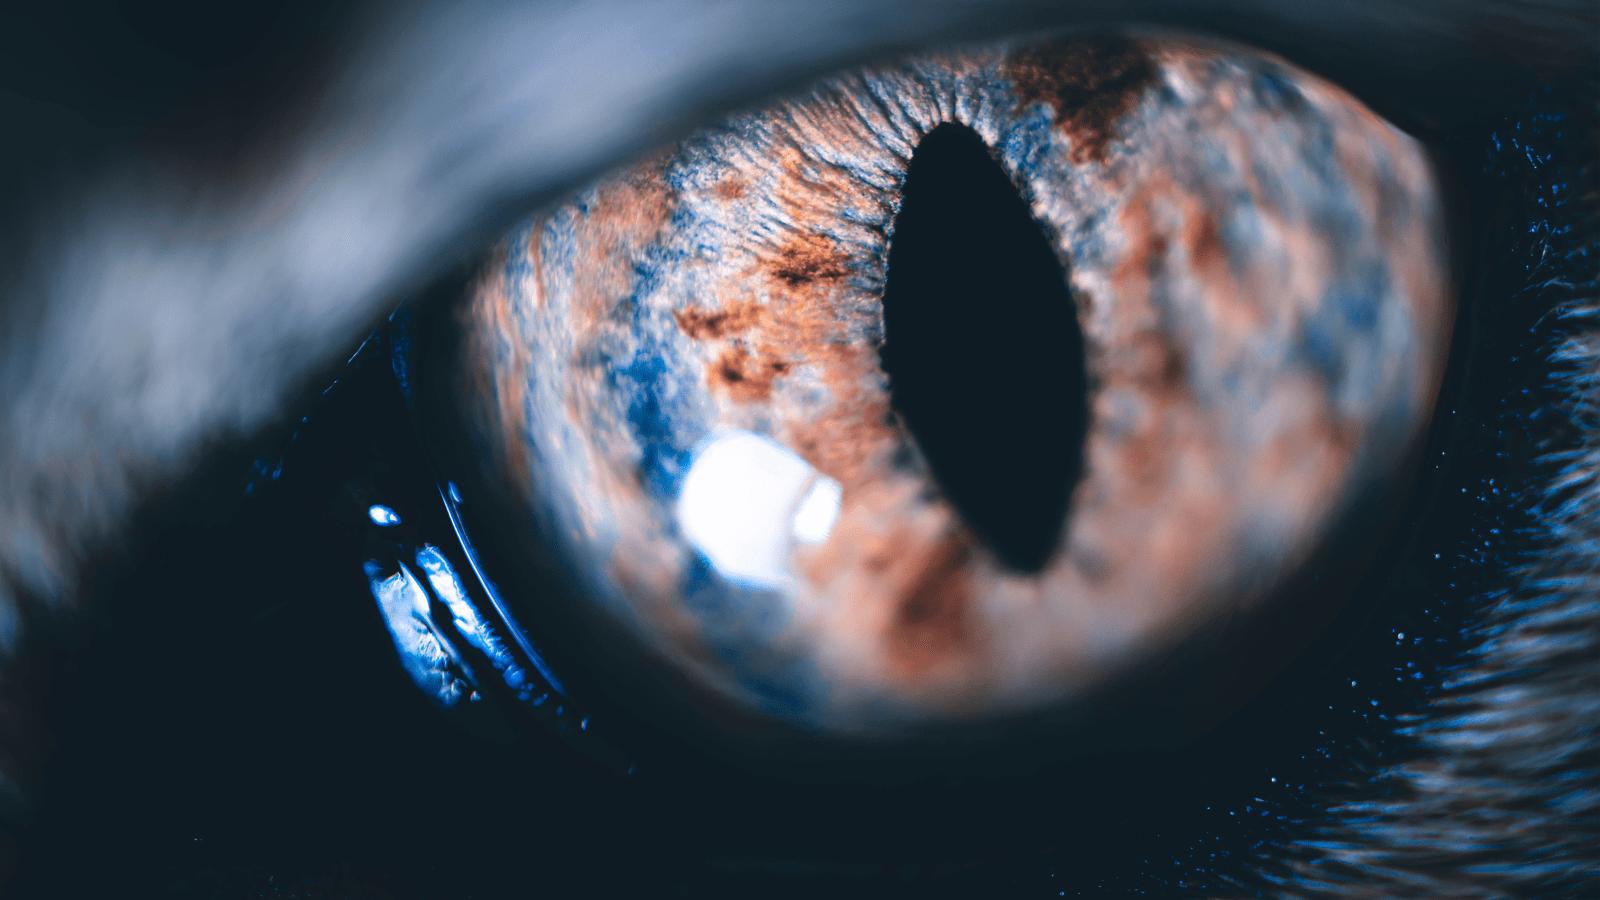 Cat eye up close